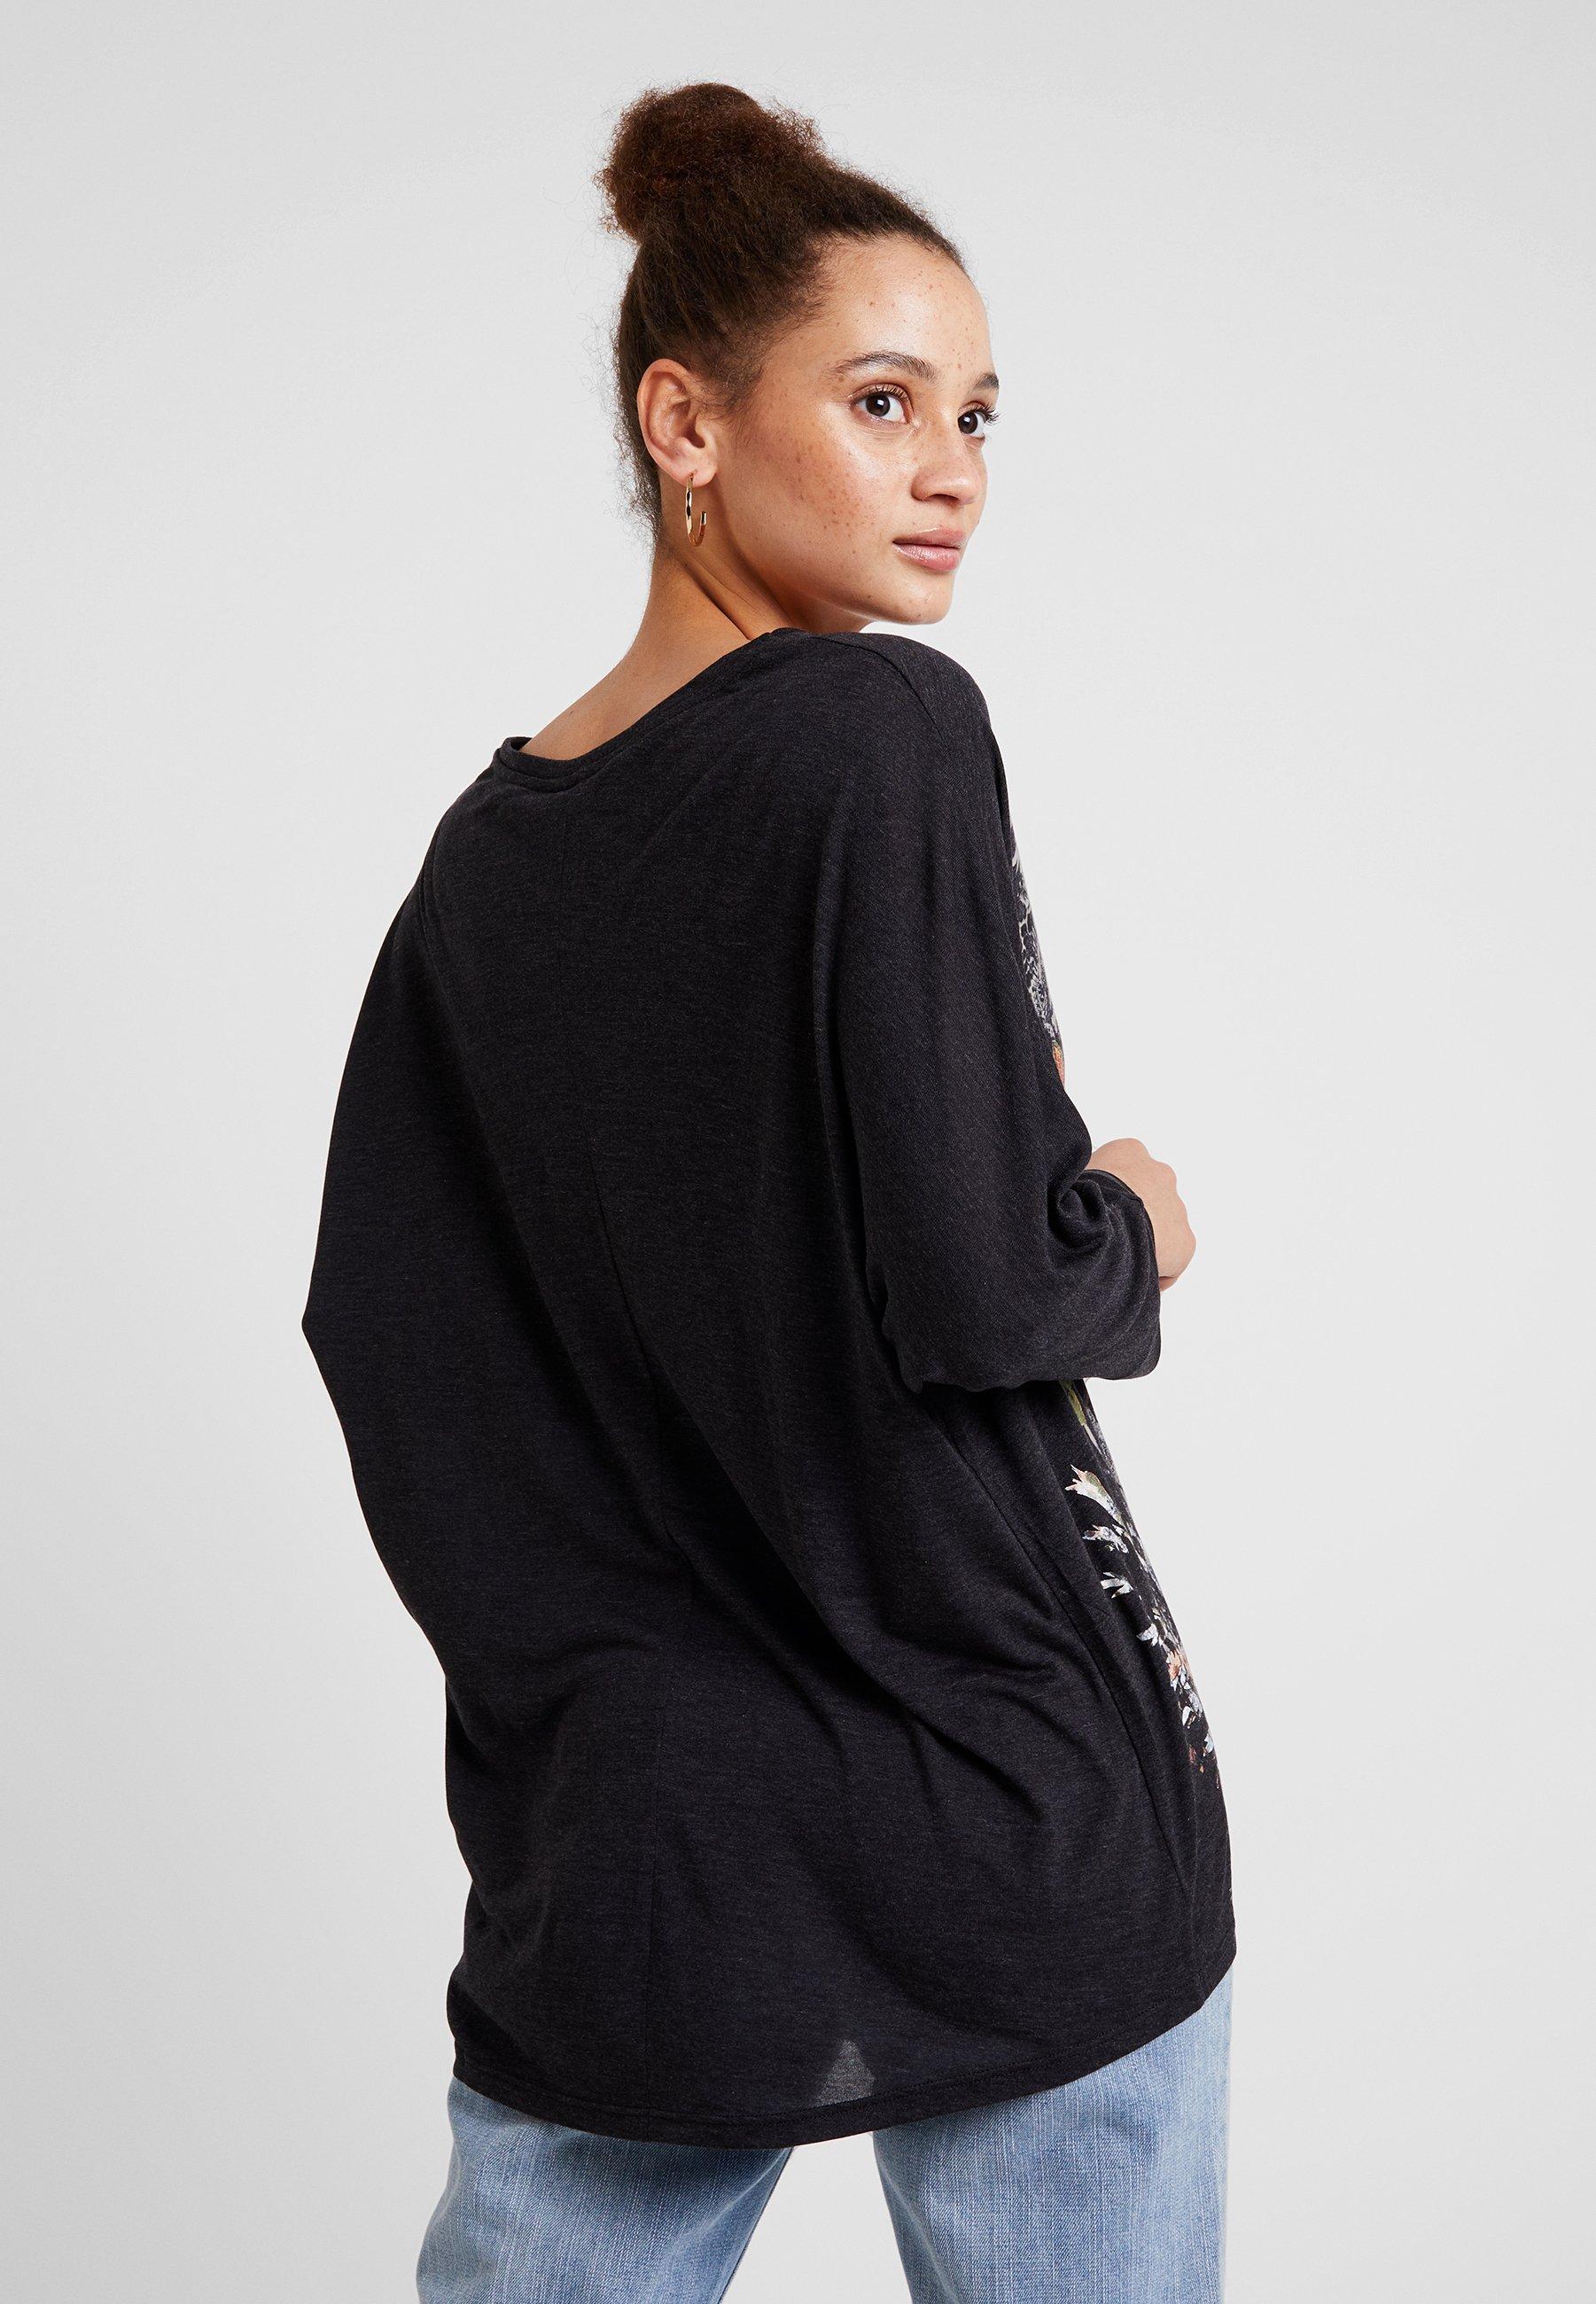 KeilaT À Manches Desigual Oscuro shirt Longues Vigore Gris ulJF3TK1c